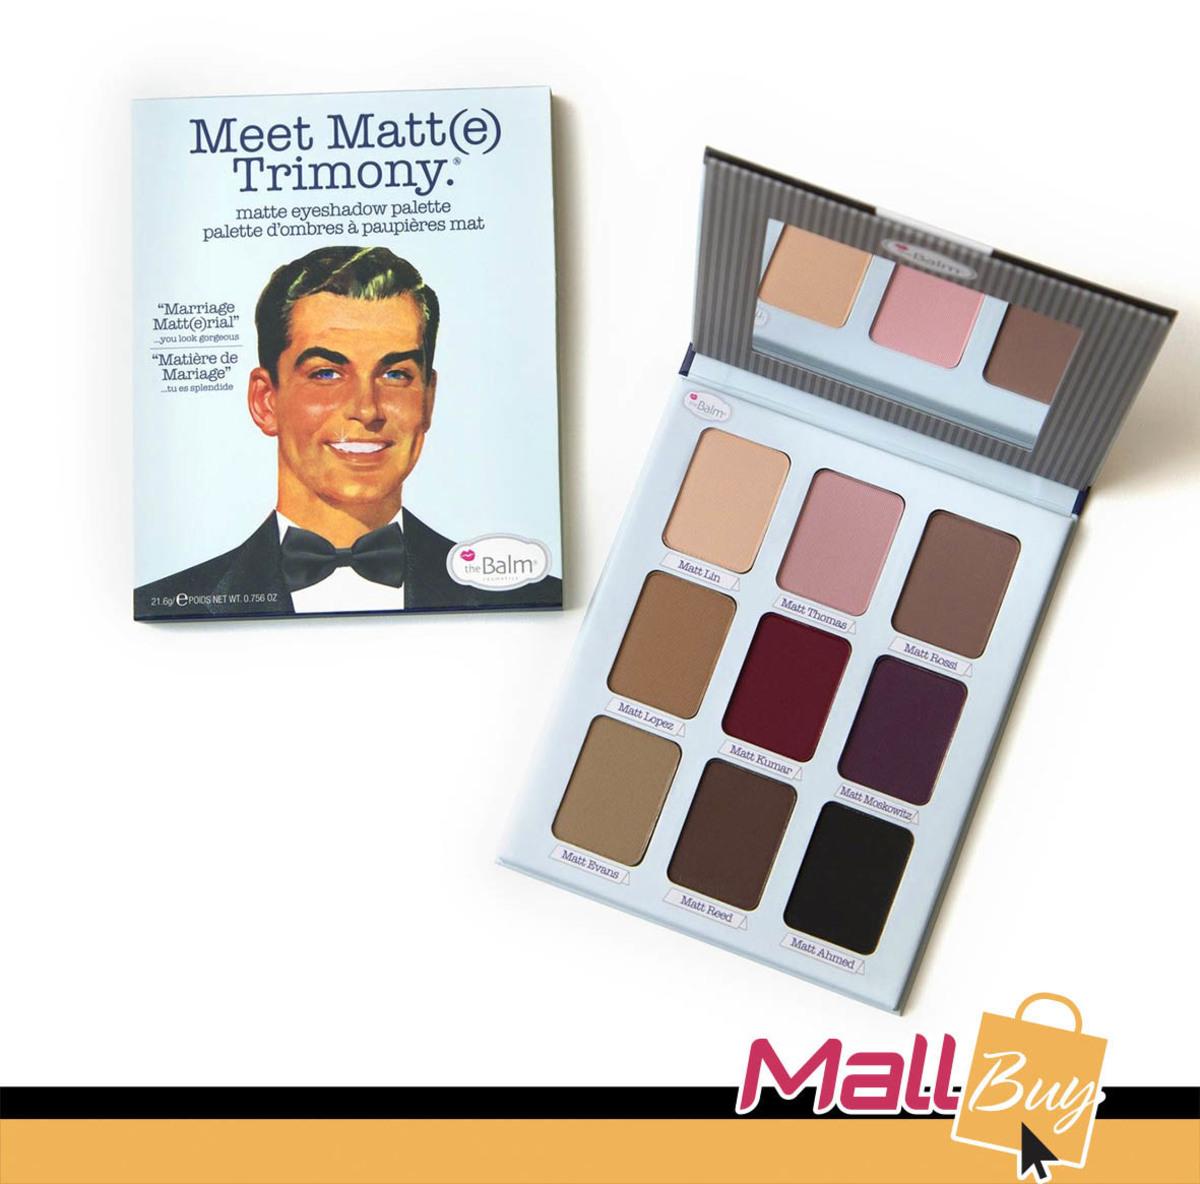 Meet Matt(e) Trimony Eyeshadow Palette